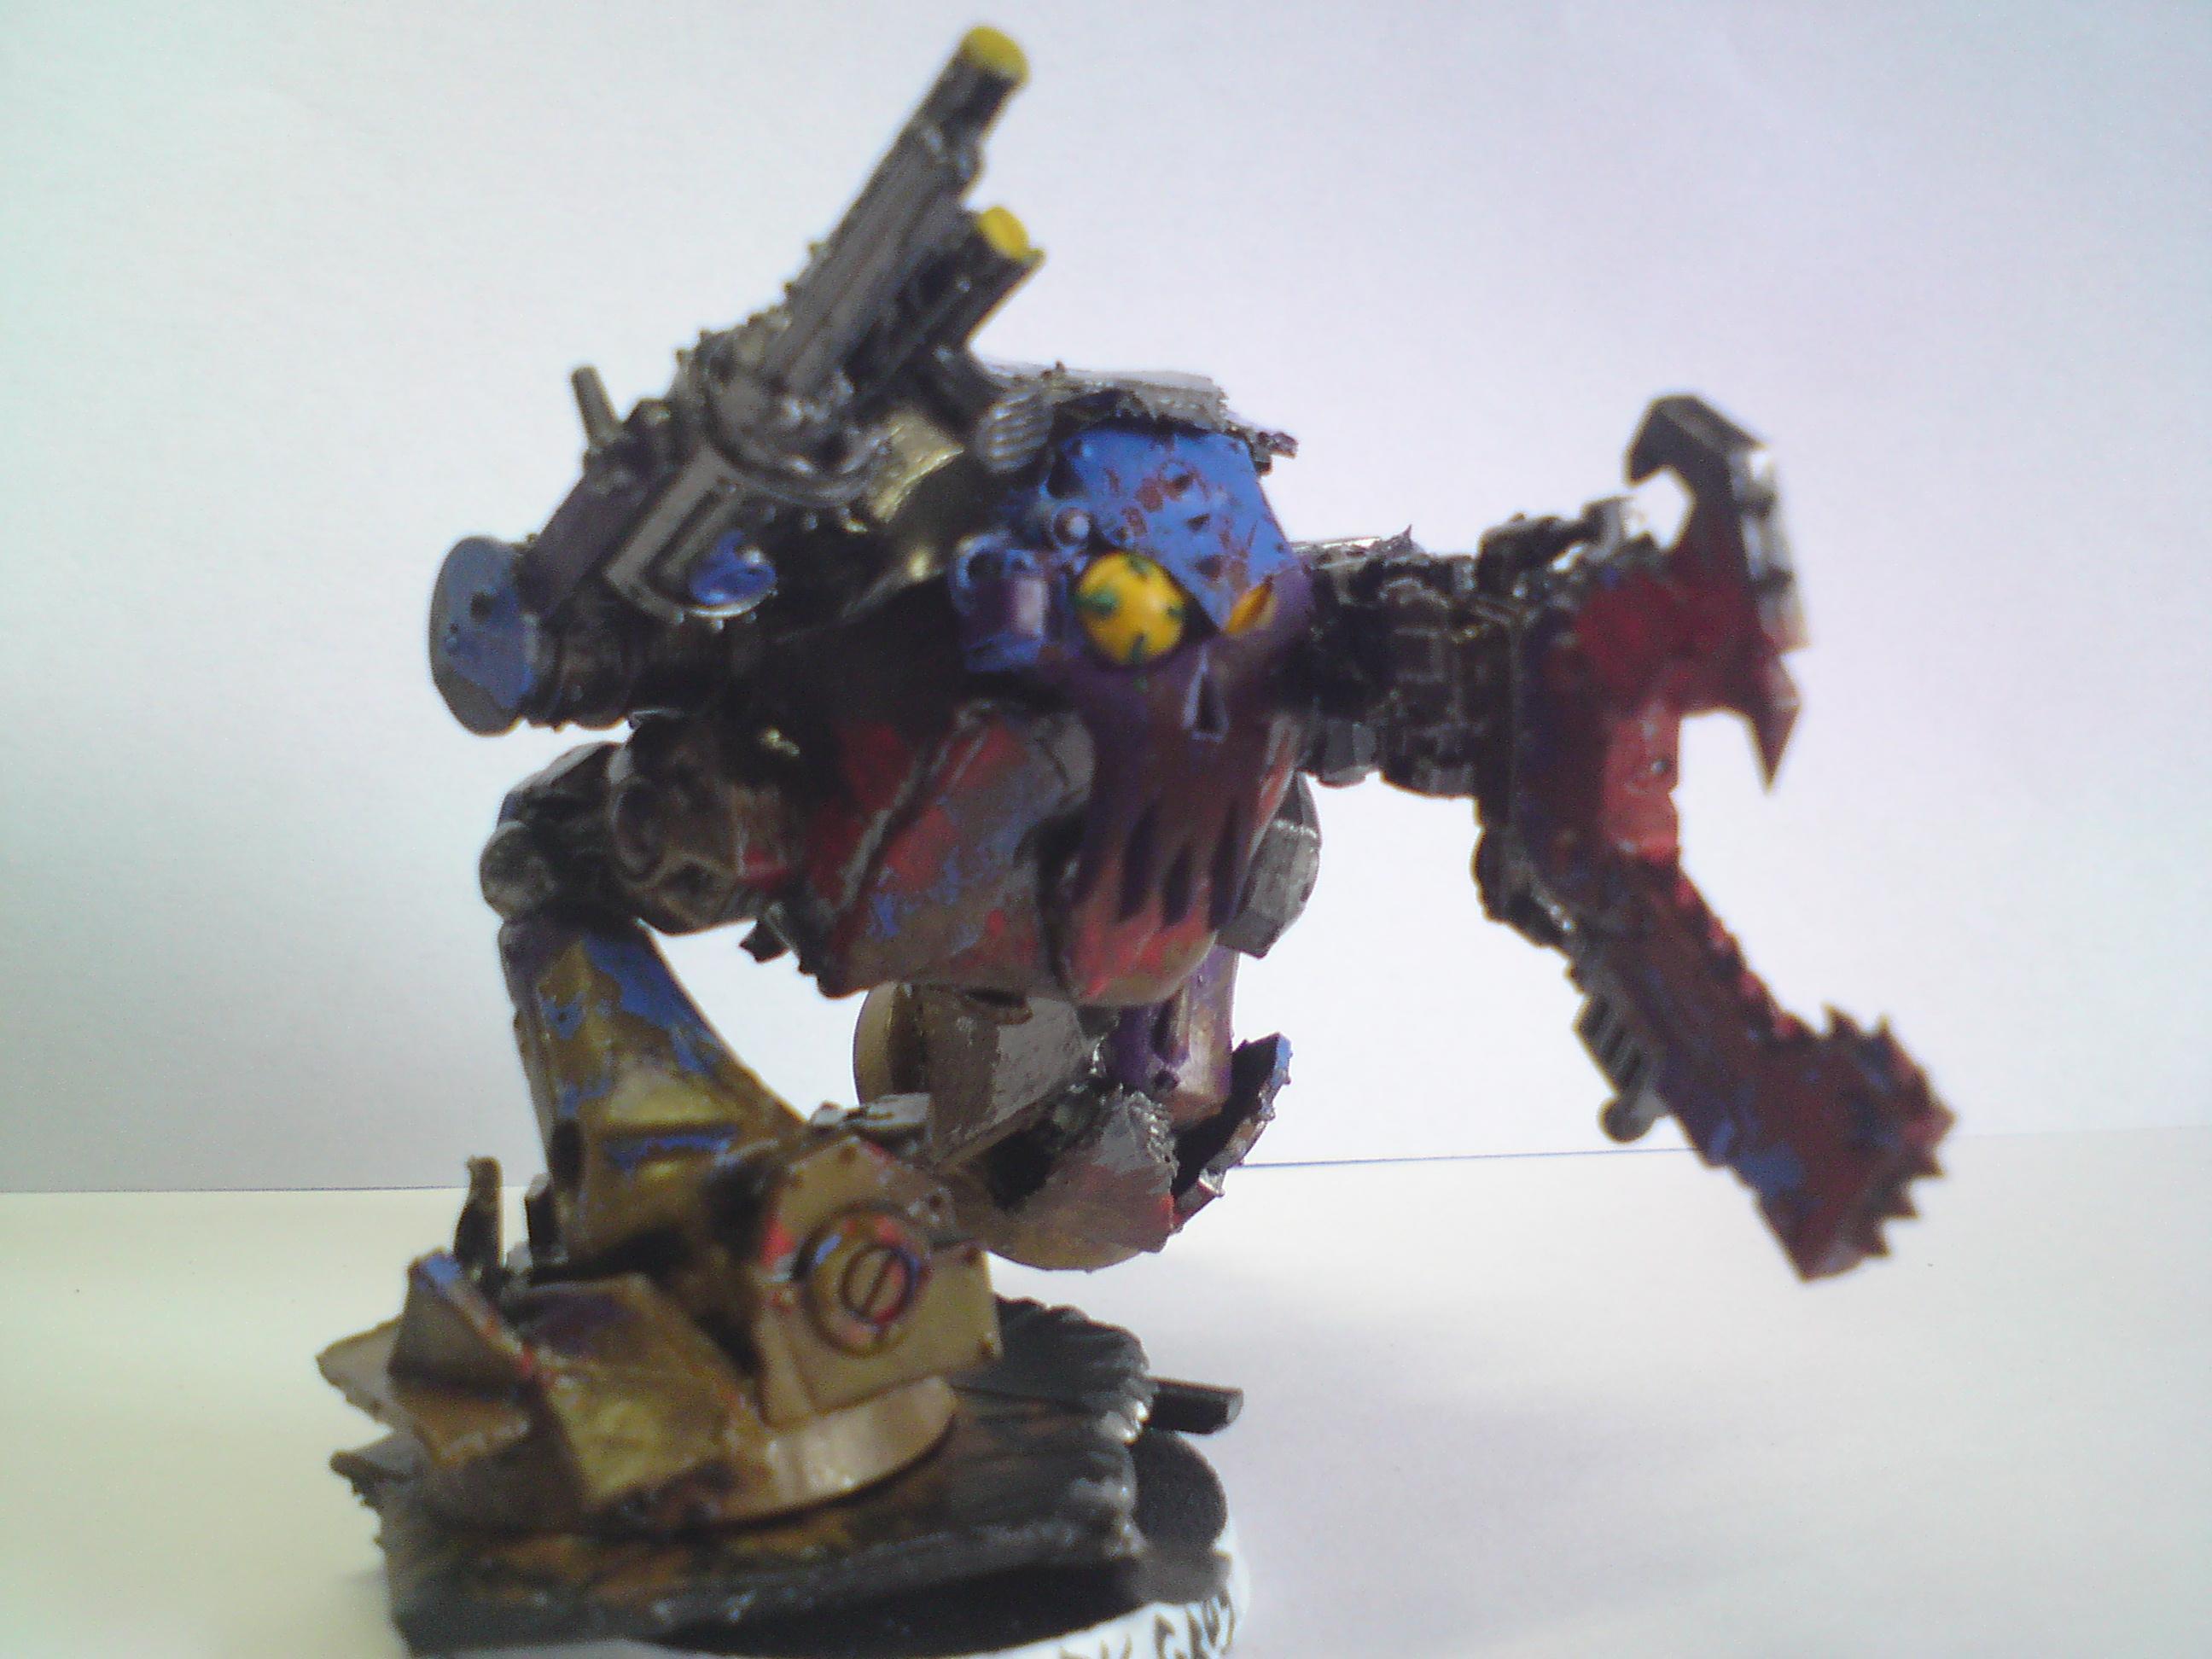 Assult On Black Reach, Deathskulls, Deff Skullz, Guard Abuse, Looted, Looting, Marine Abuse, Ork Deathskulls, Orks, Trucks, Wagons, Warhammer 40,000